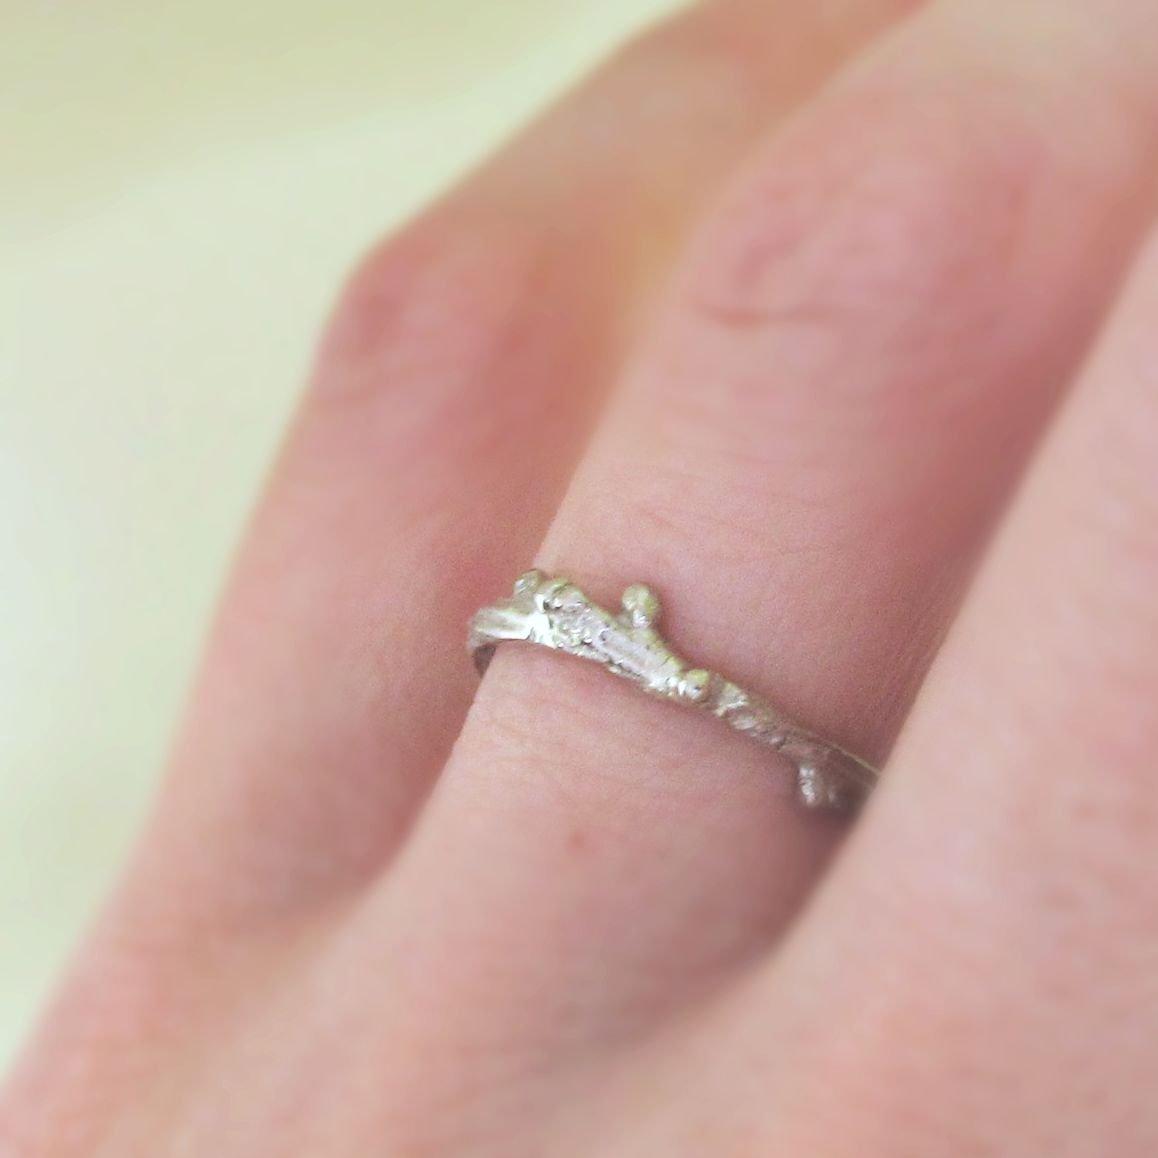 Amazon.com: Live Oak Stacking Ring in 14k Palladium White Gold: Handmade